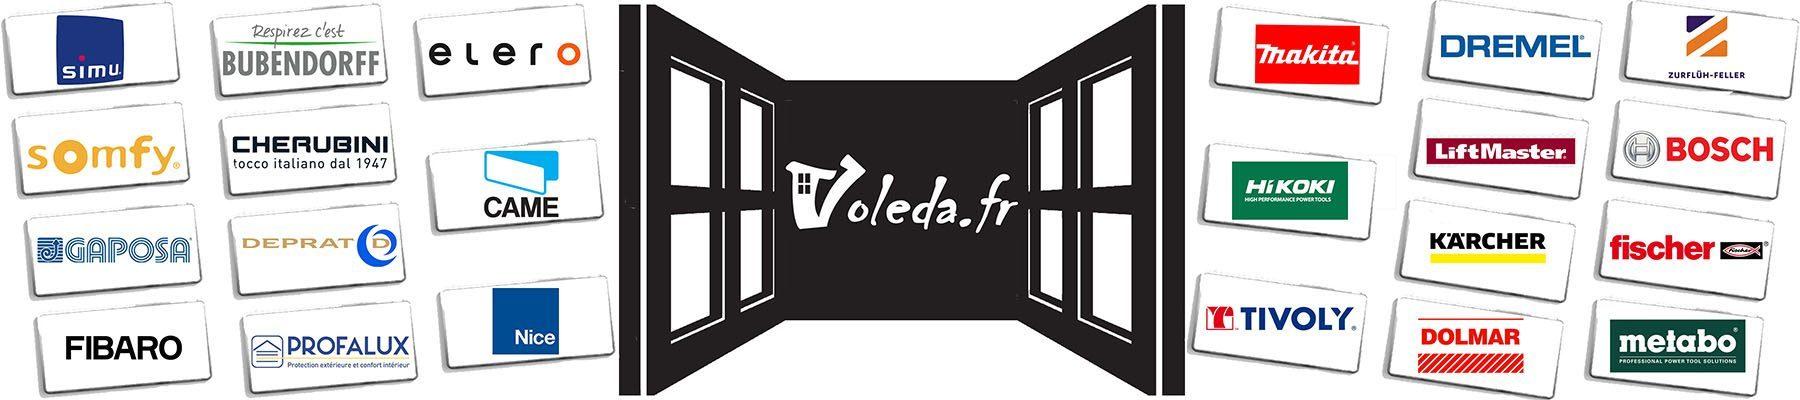 Voleda.fr distributeur des plus grandes marques: Somfy, Cherubini, Nice, Makita, Gaposa, Bubendorff, Simu, Fibaro, Bosch